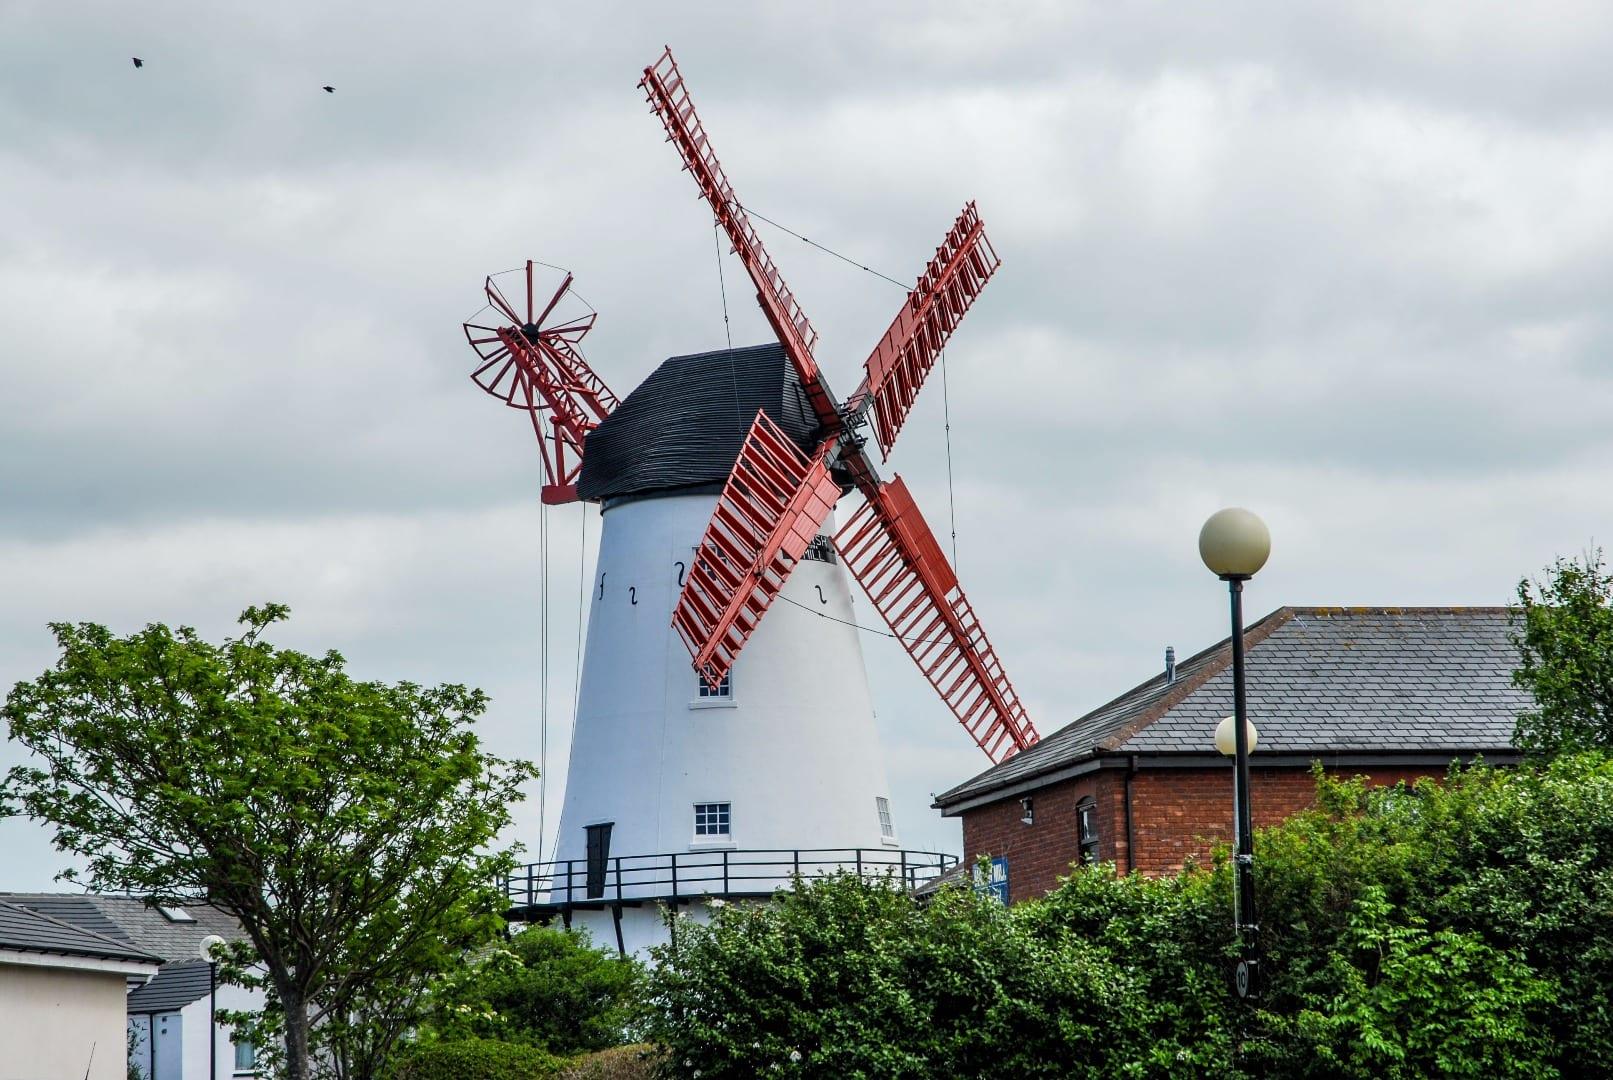 Marsh Mill windmill at Thornton